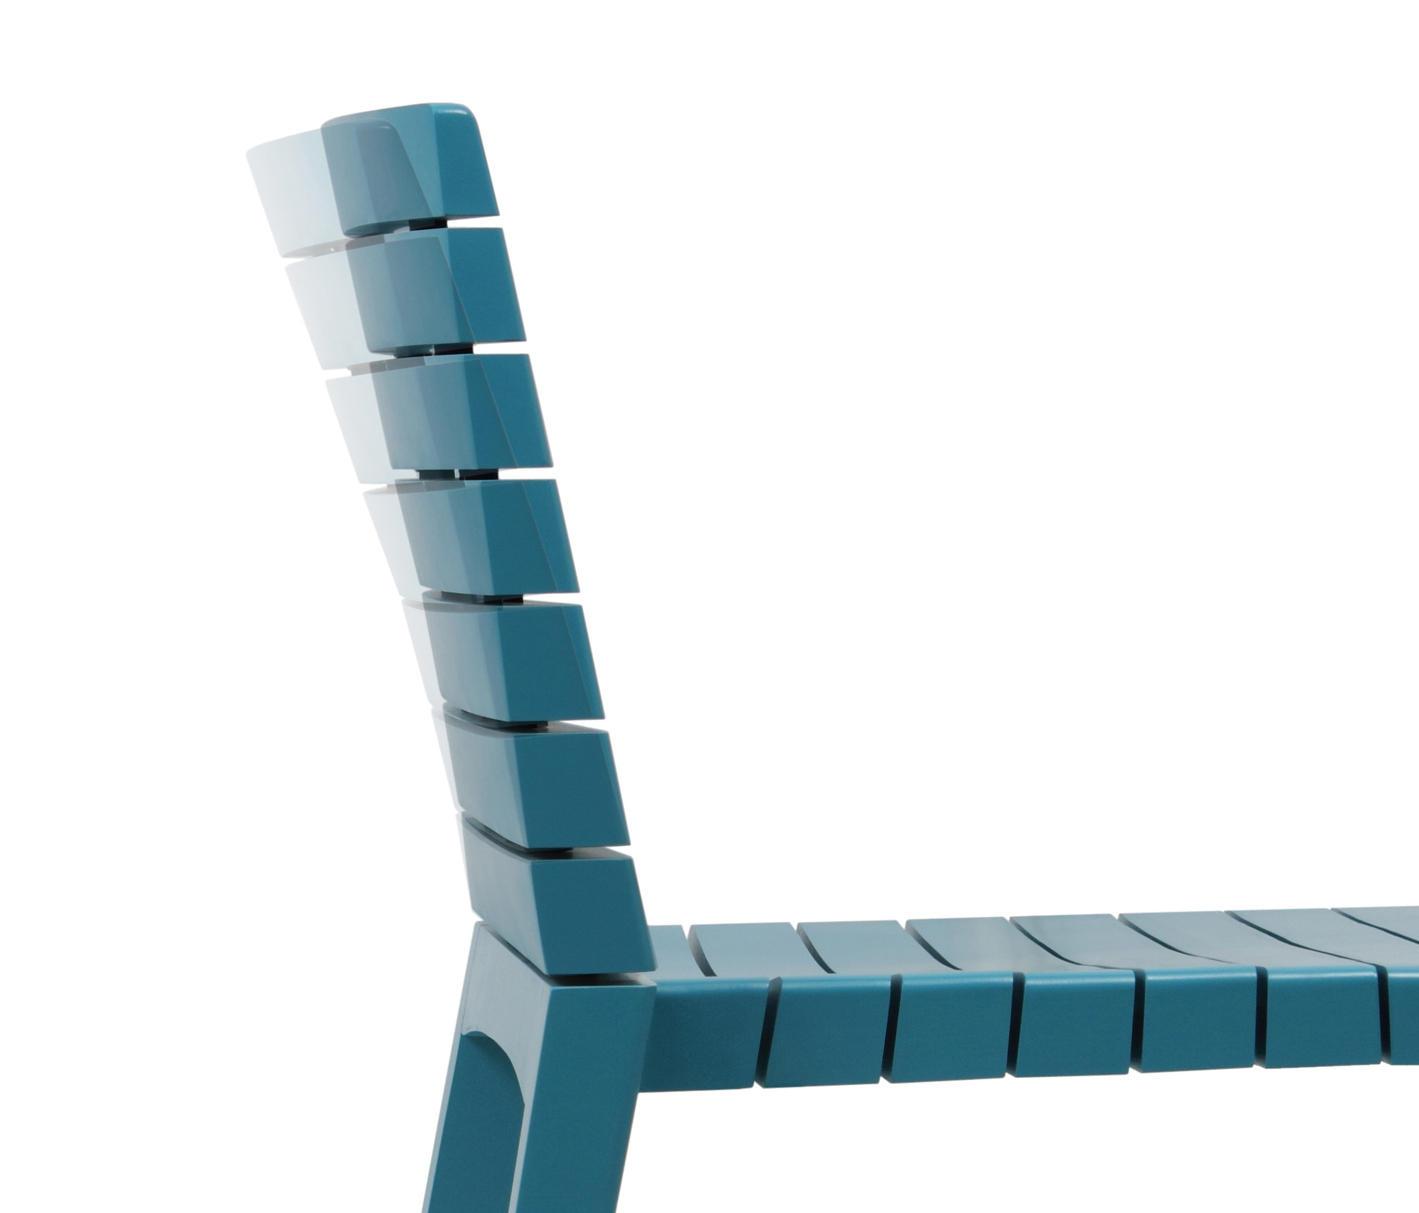 Room 215 Rip Ost: RIP CHAIR - Chairs From Schneiderschram